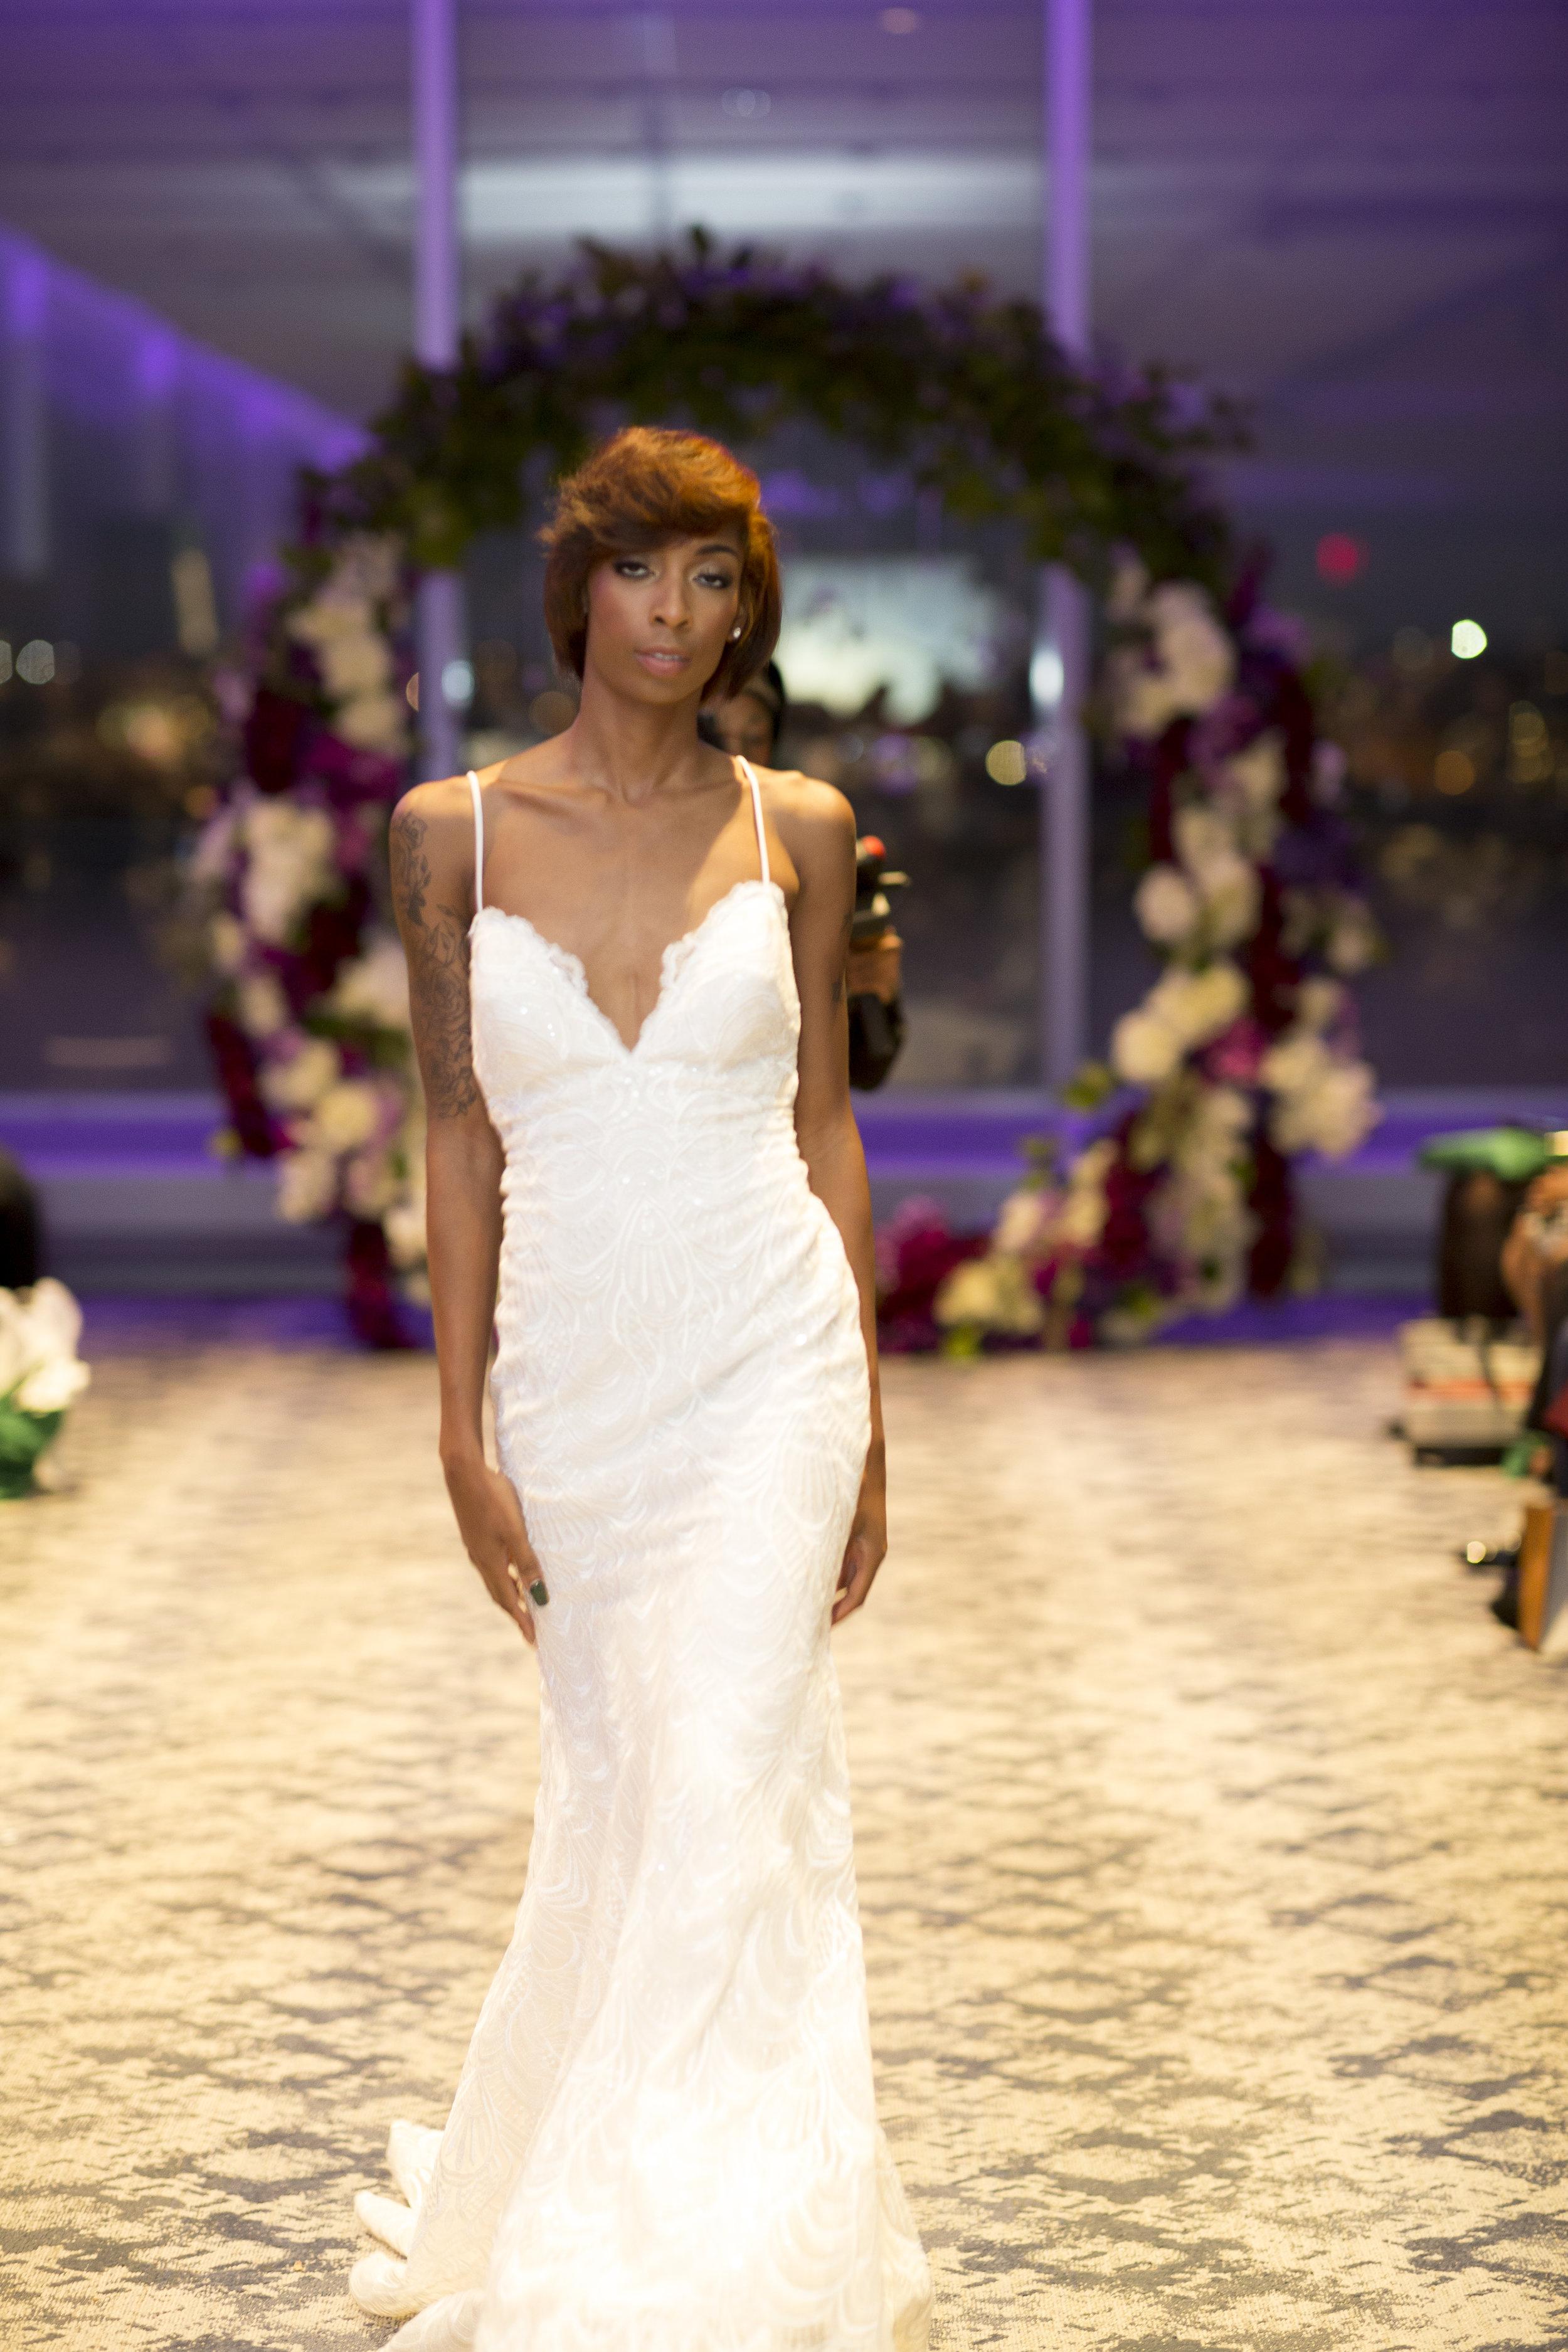 dc-wedding-expo-andrew-roby-events